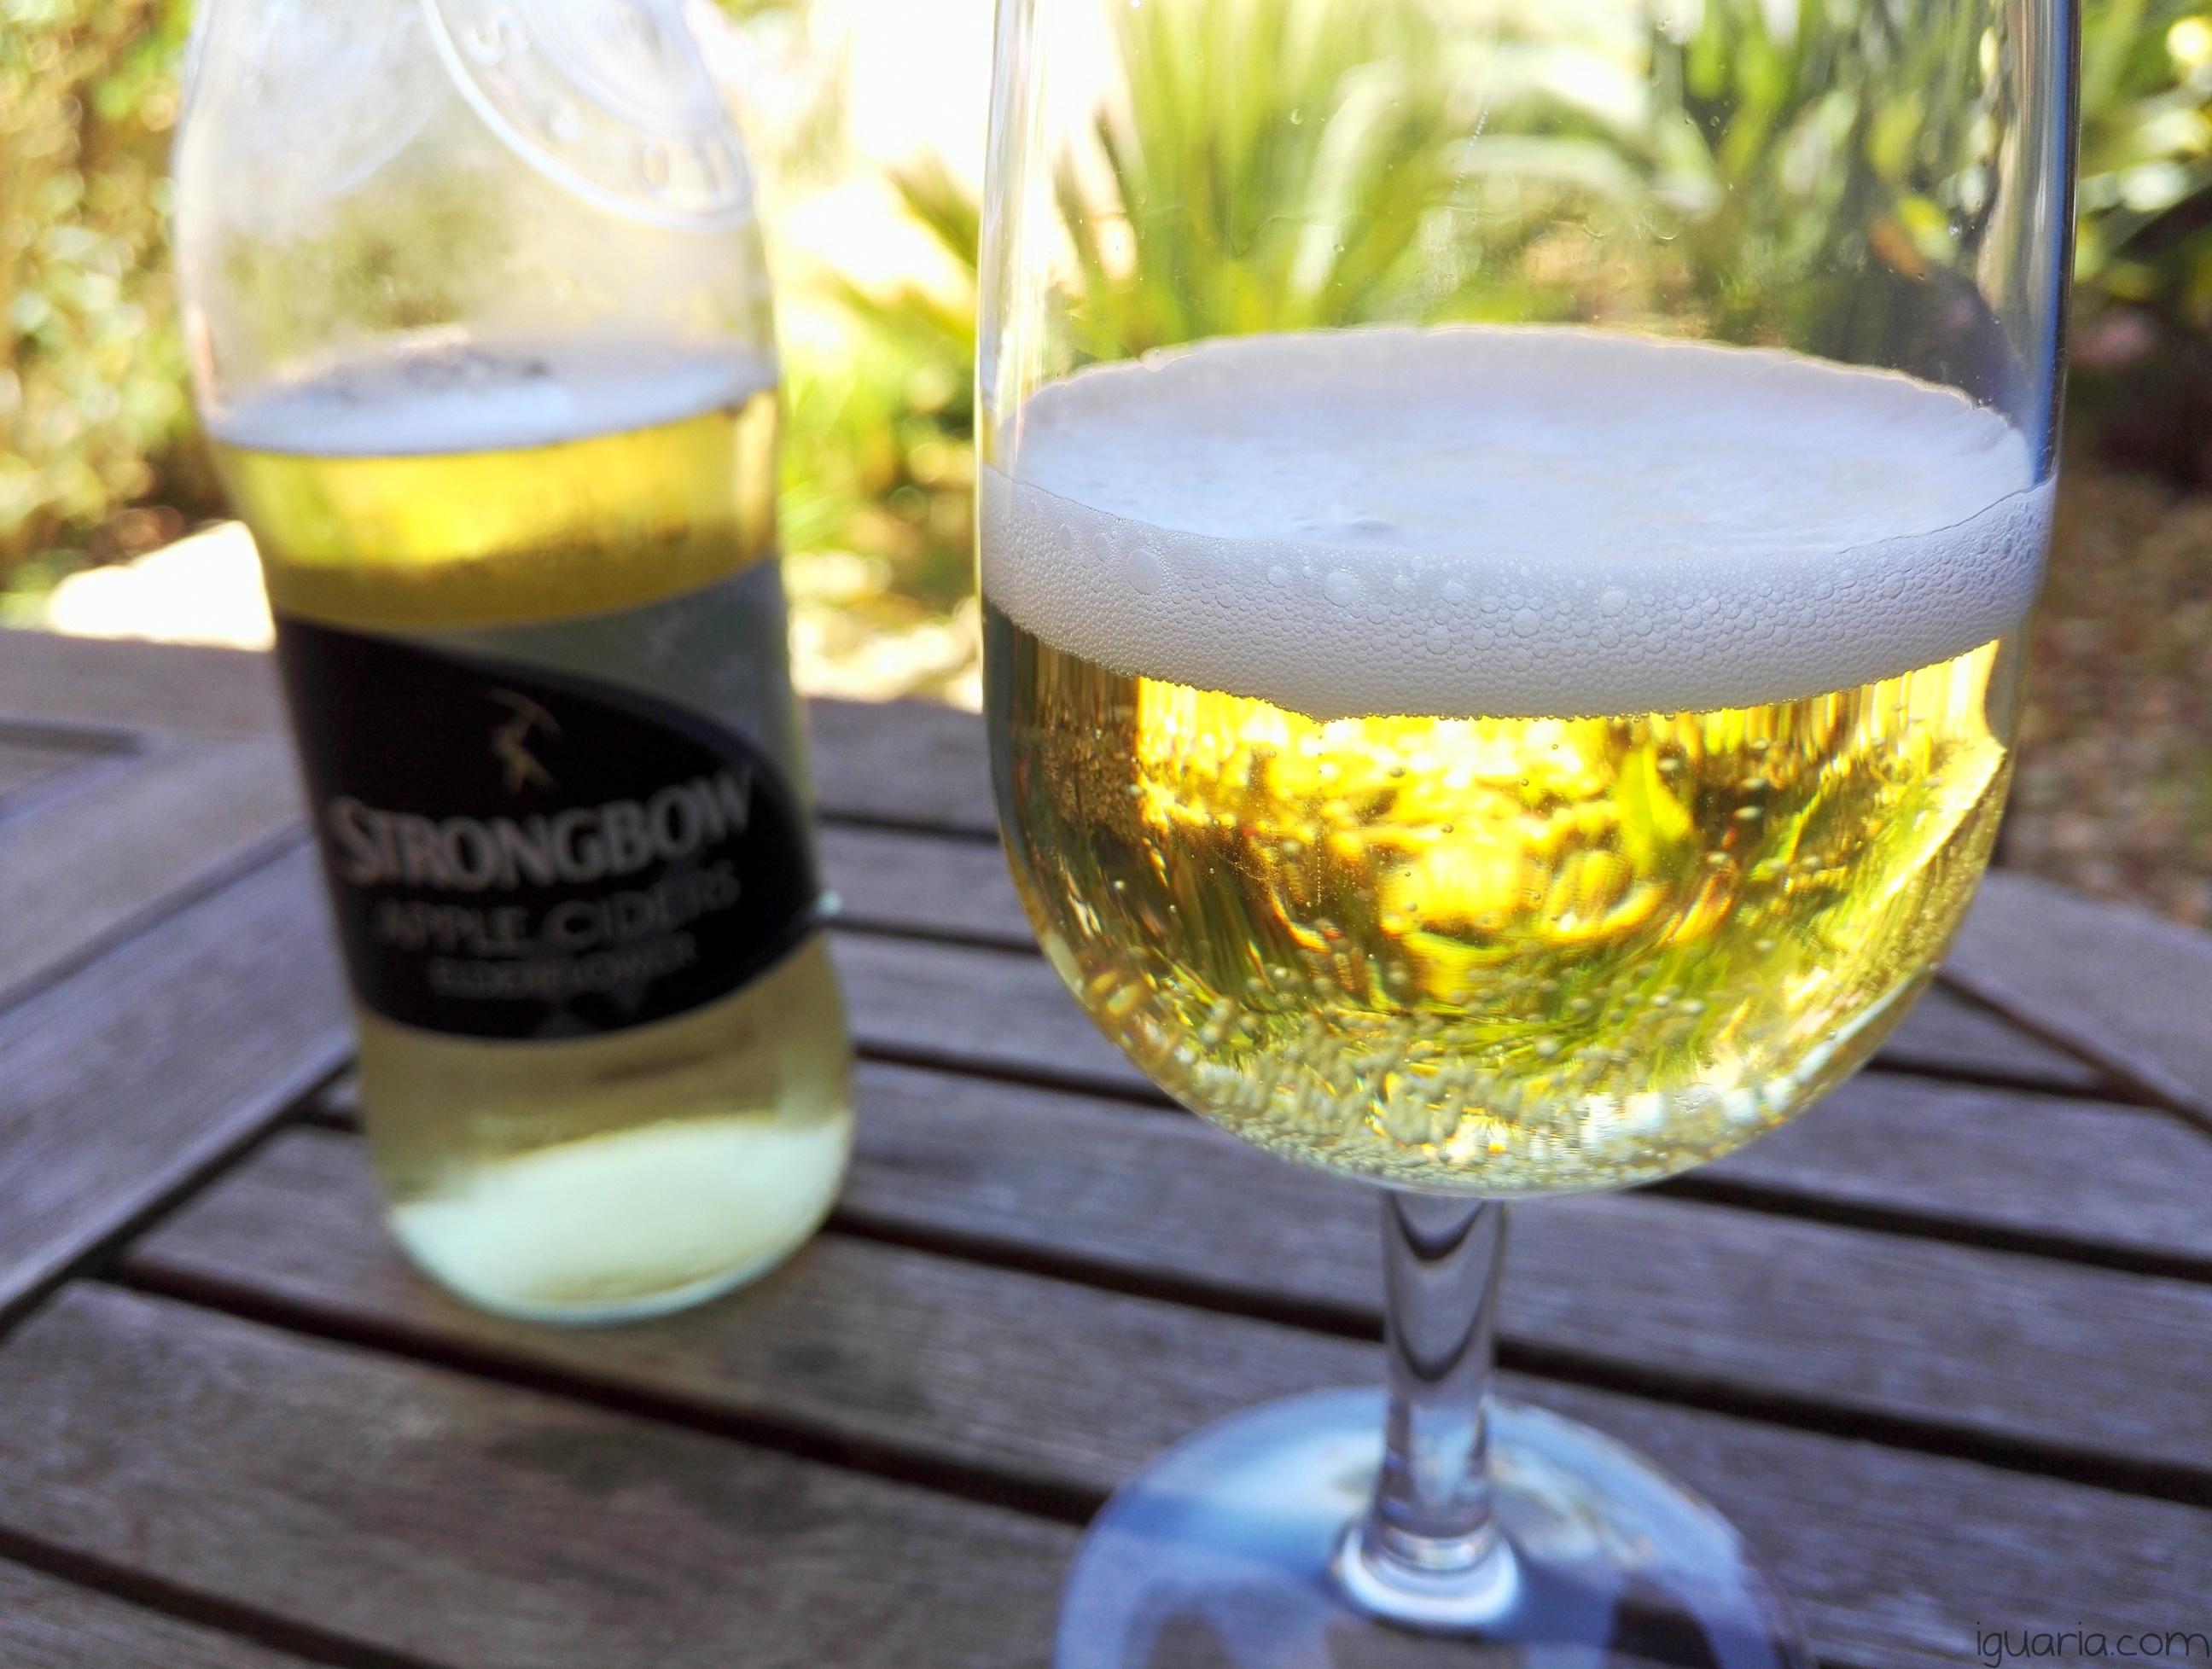 iguaria-copo-de-sidra-strongbow